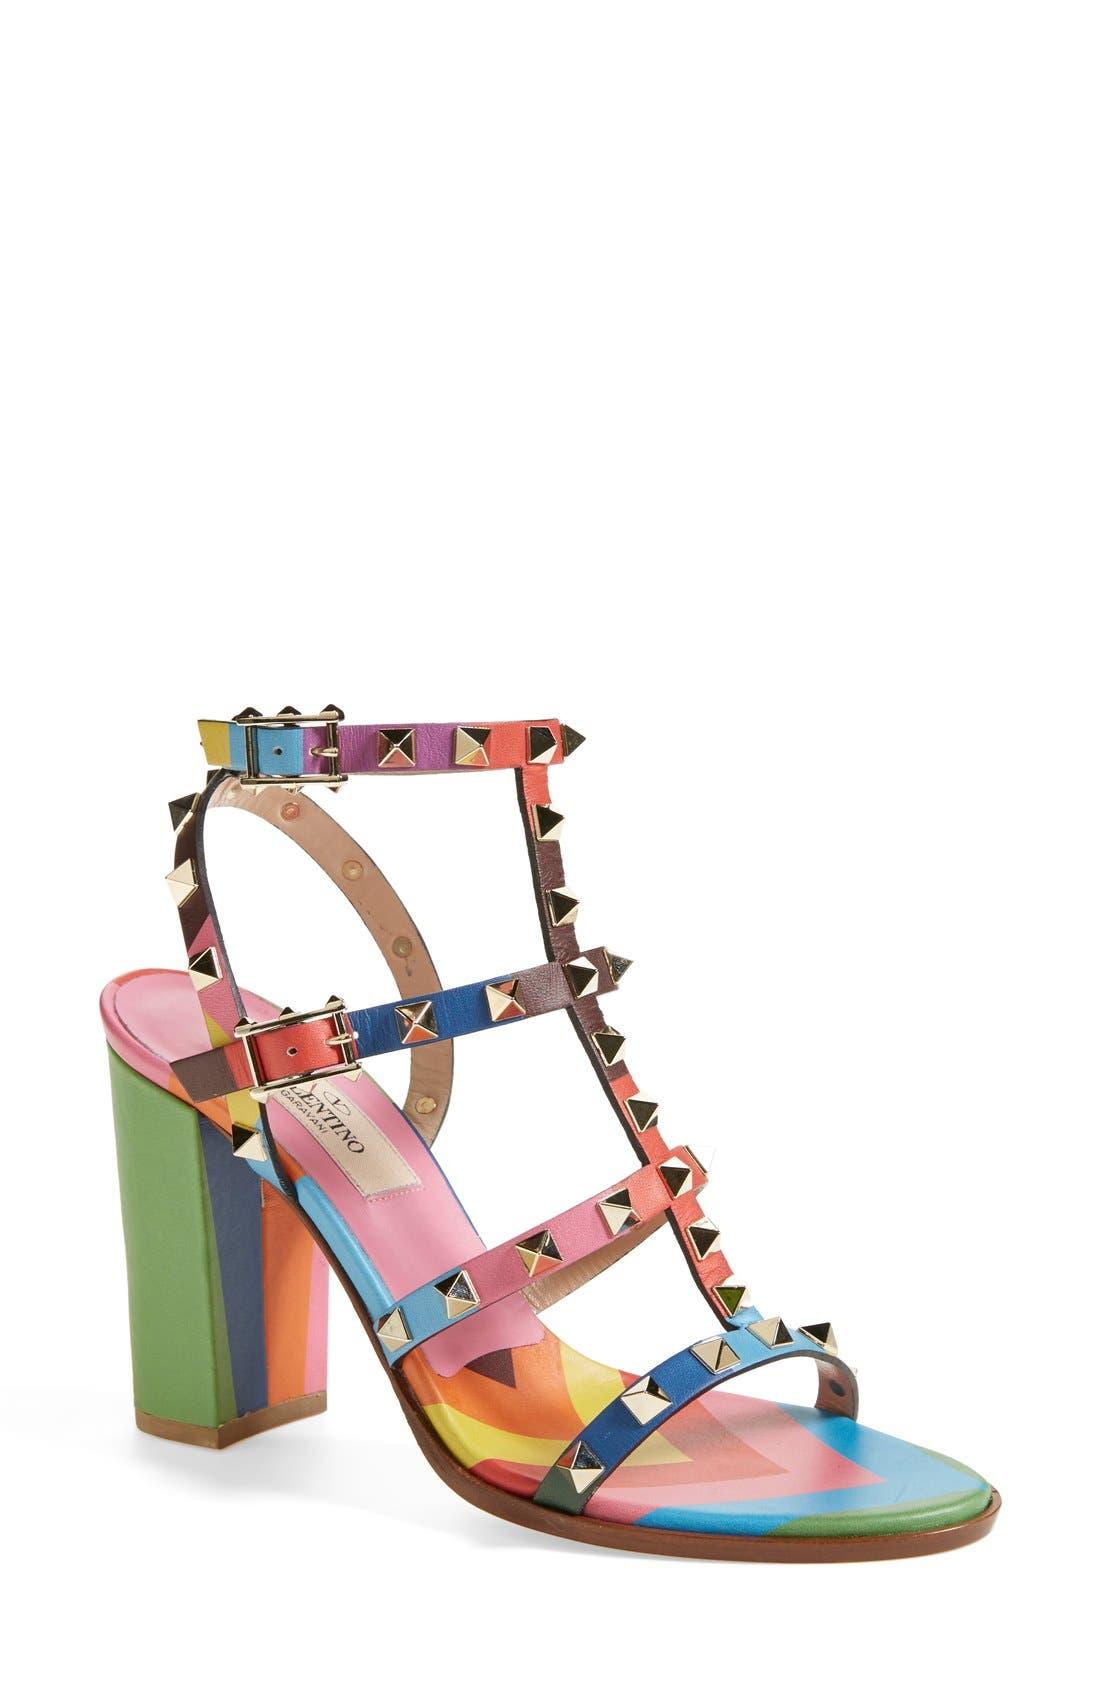 Alternate Image 1 Selected - Valentino 'Rockstud' T-Strap Sandal (Women)